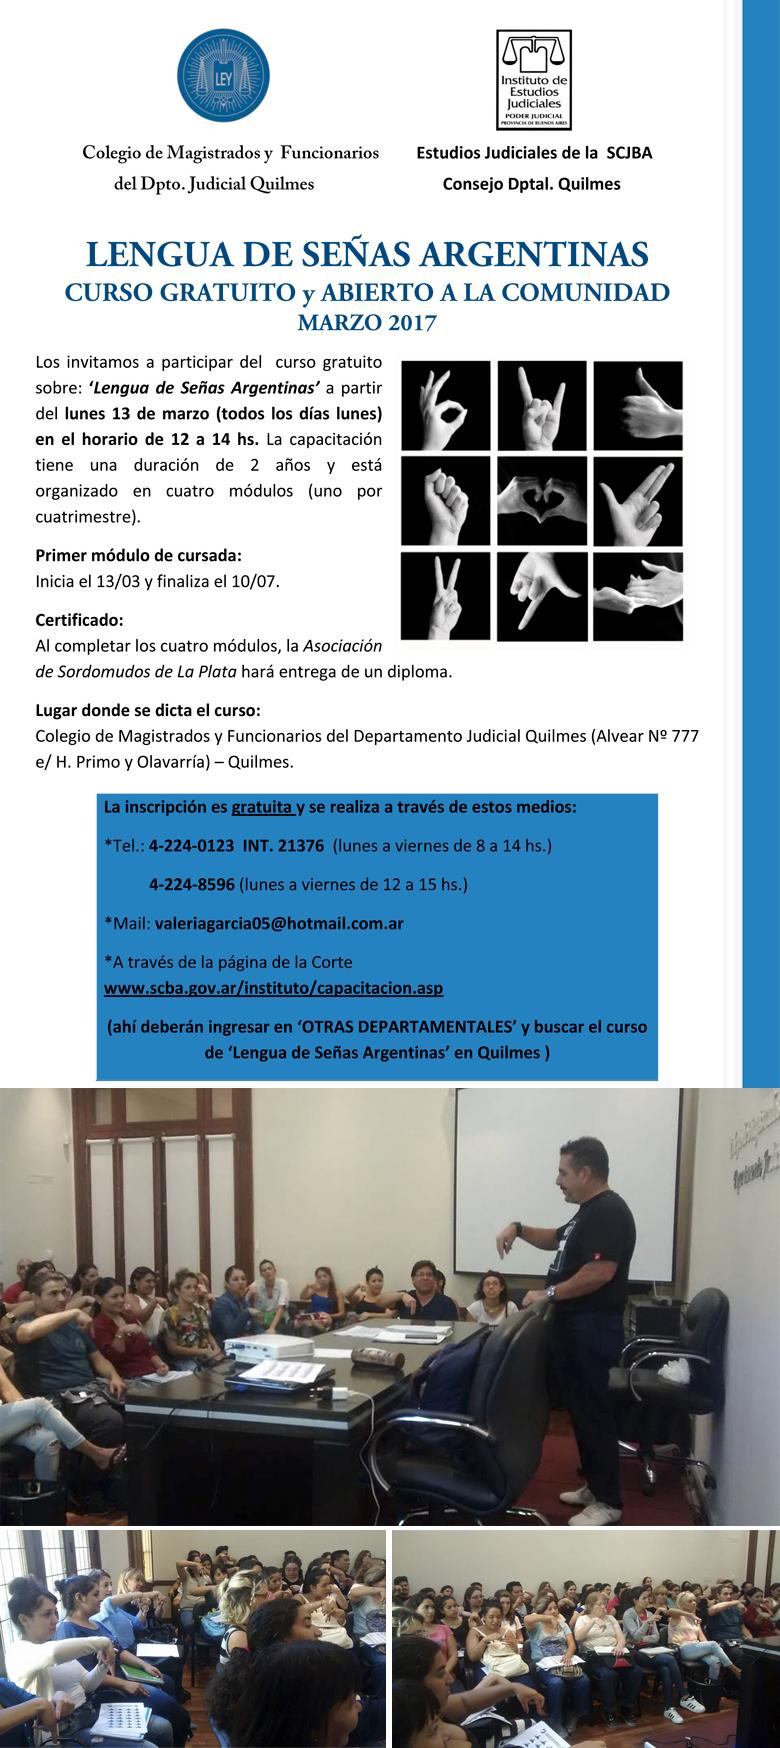 Curso gratuito sobre: LENGUA DE SEÑAS ARGENTINAS